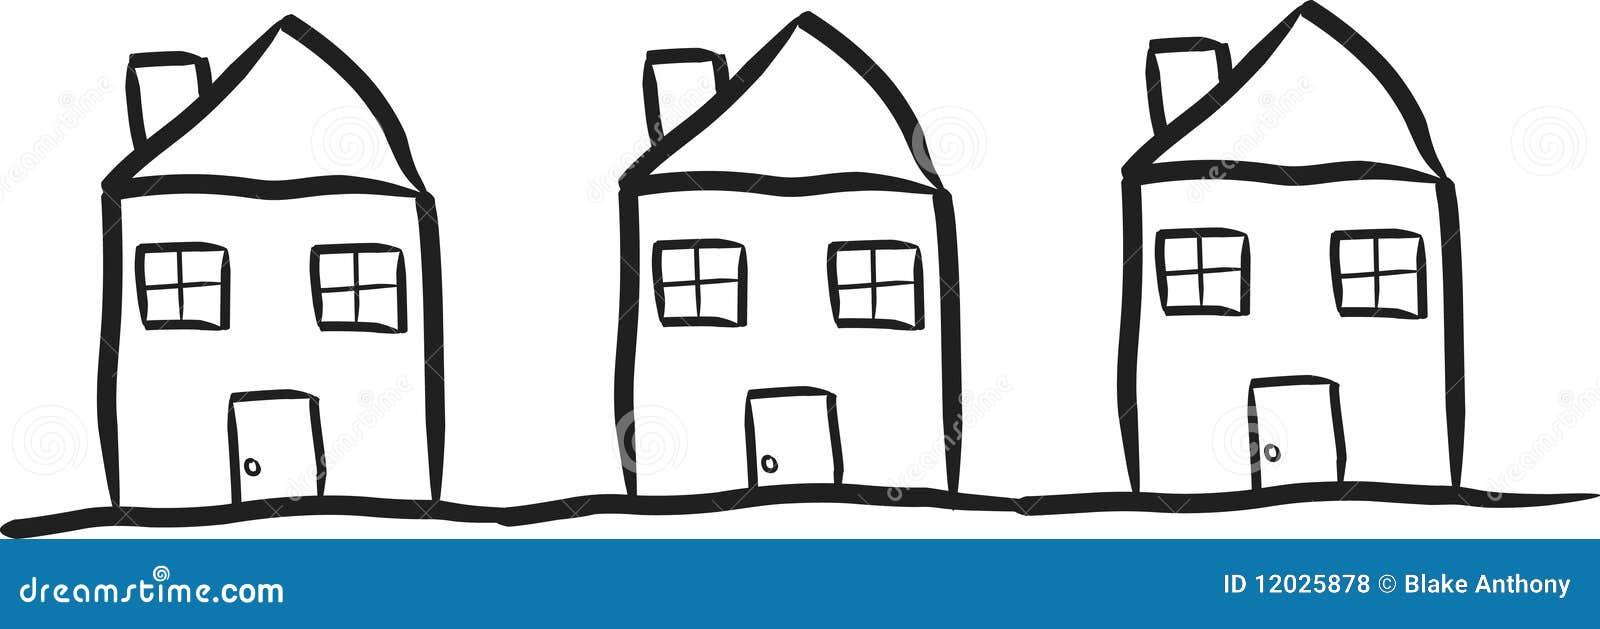 bescheidene h user lizenzfreie stockfotos bild 12025878. Black Bedroom Furniture Sets. Home Design Ideas